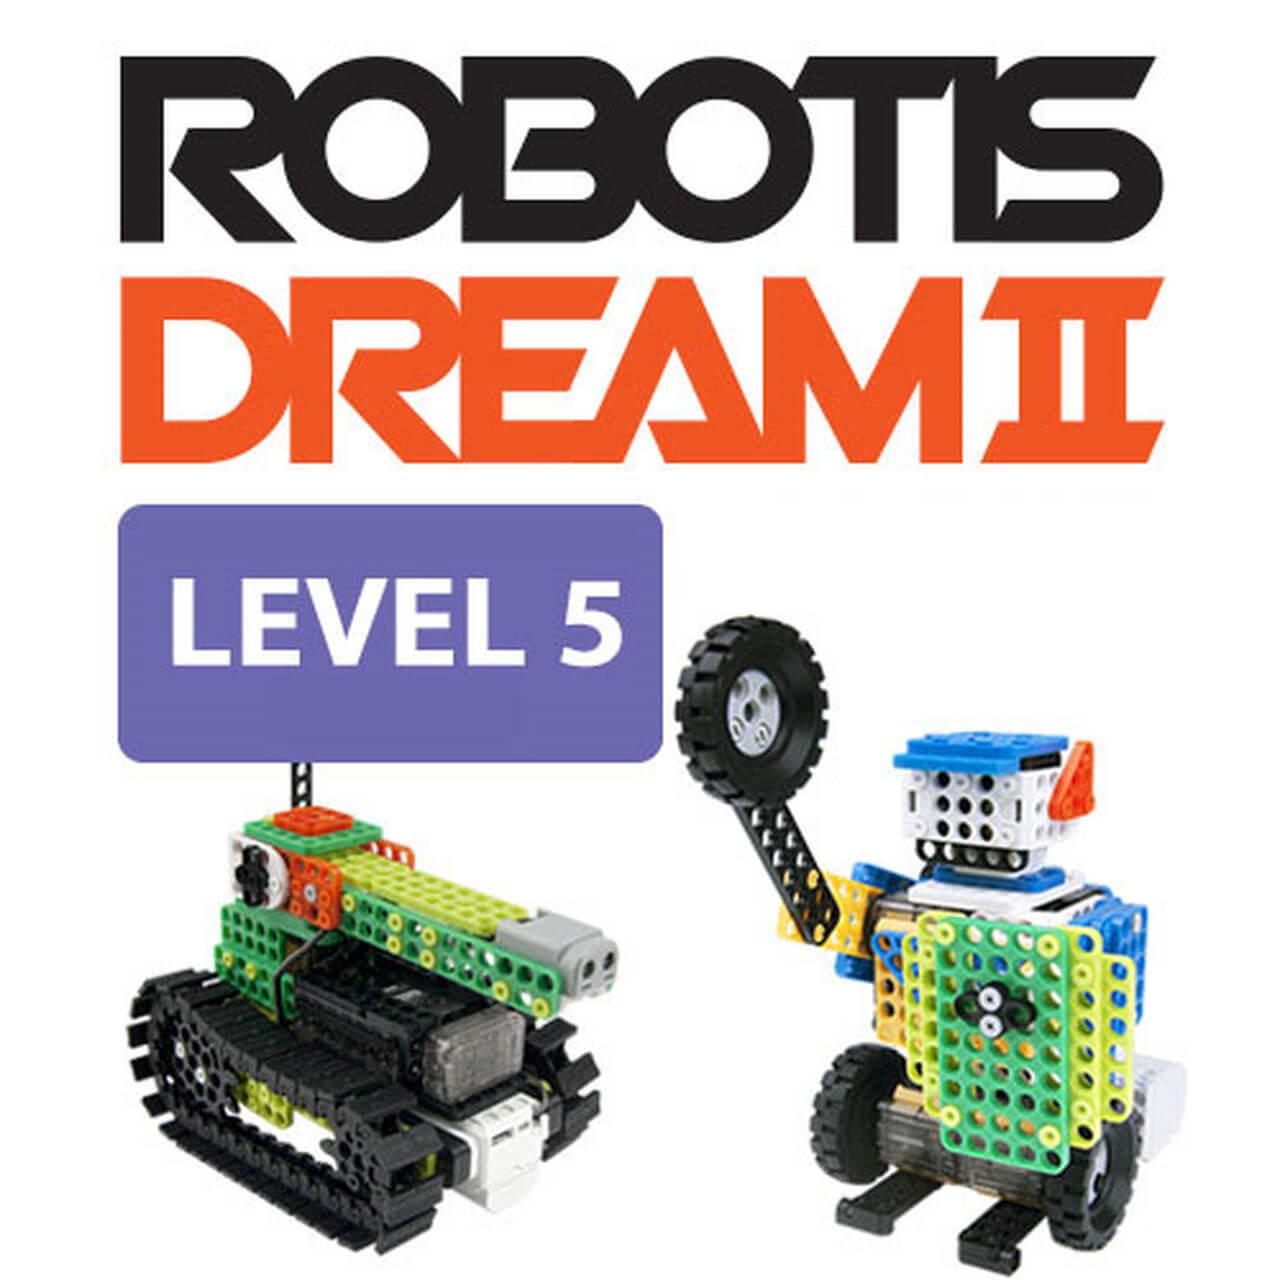 ROBOTIS-DREAM-Level-5-eğitim-seti.jpg (250 KB)